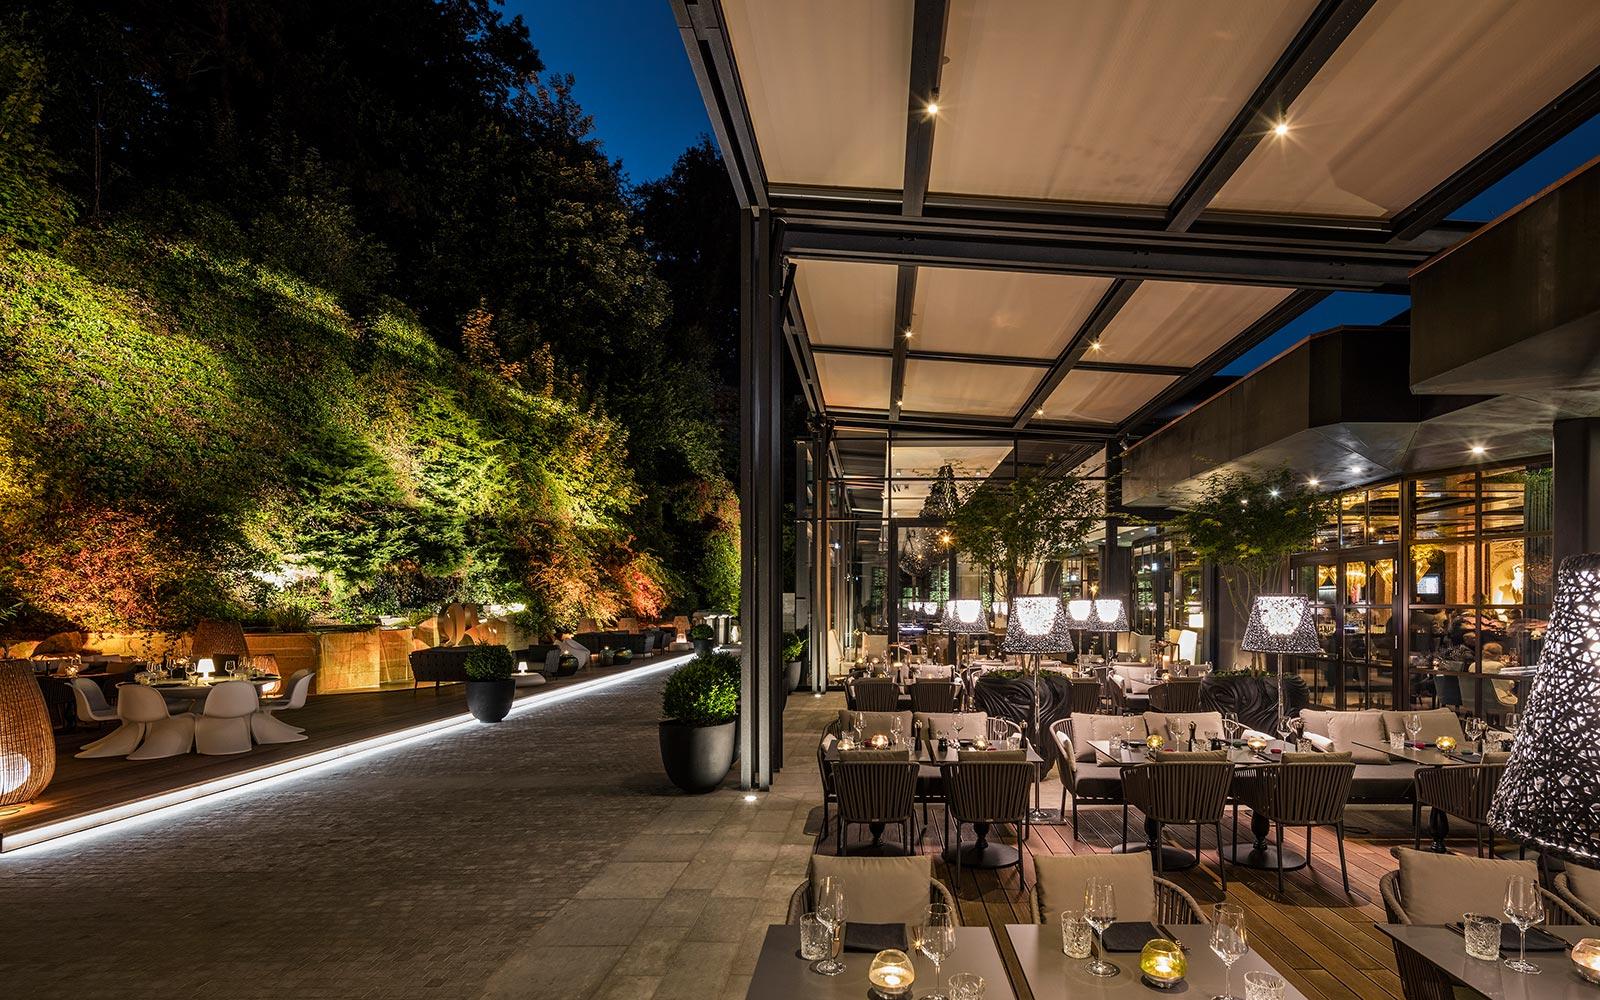 The Grill Baden Baden